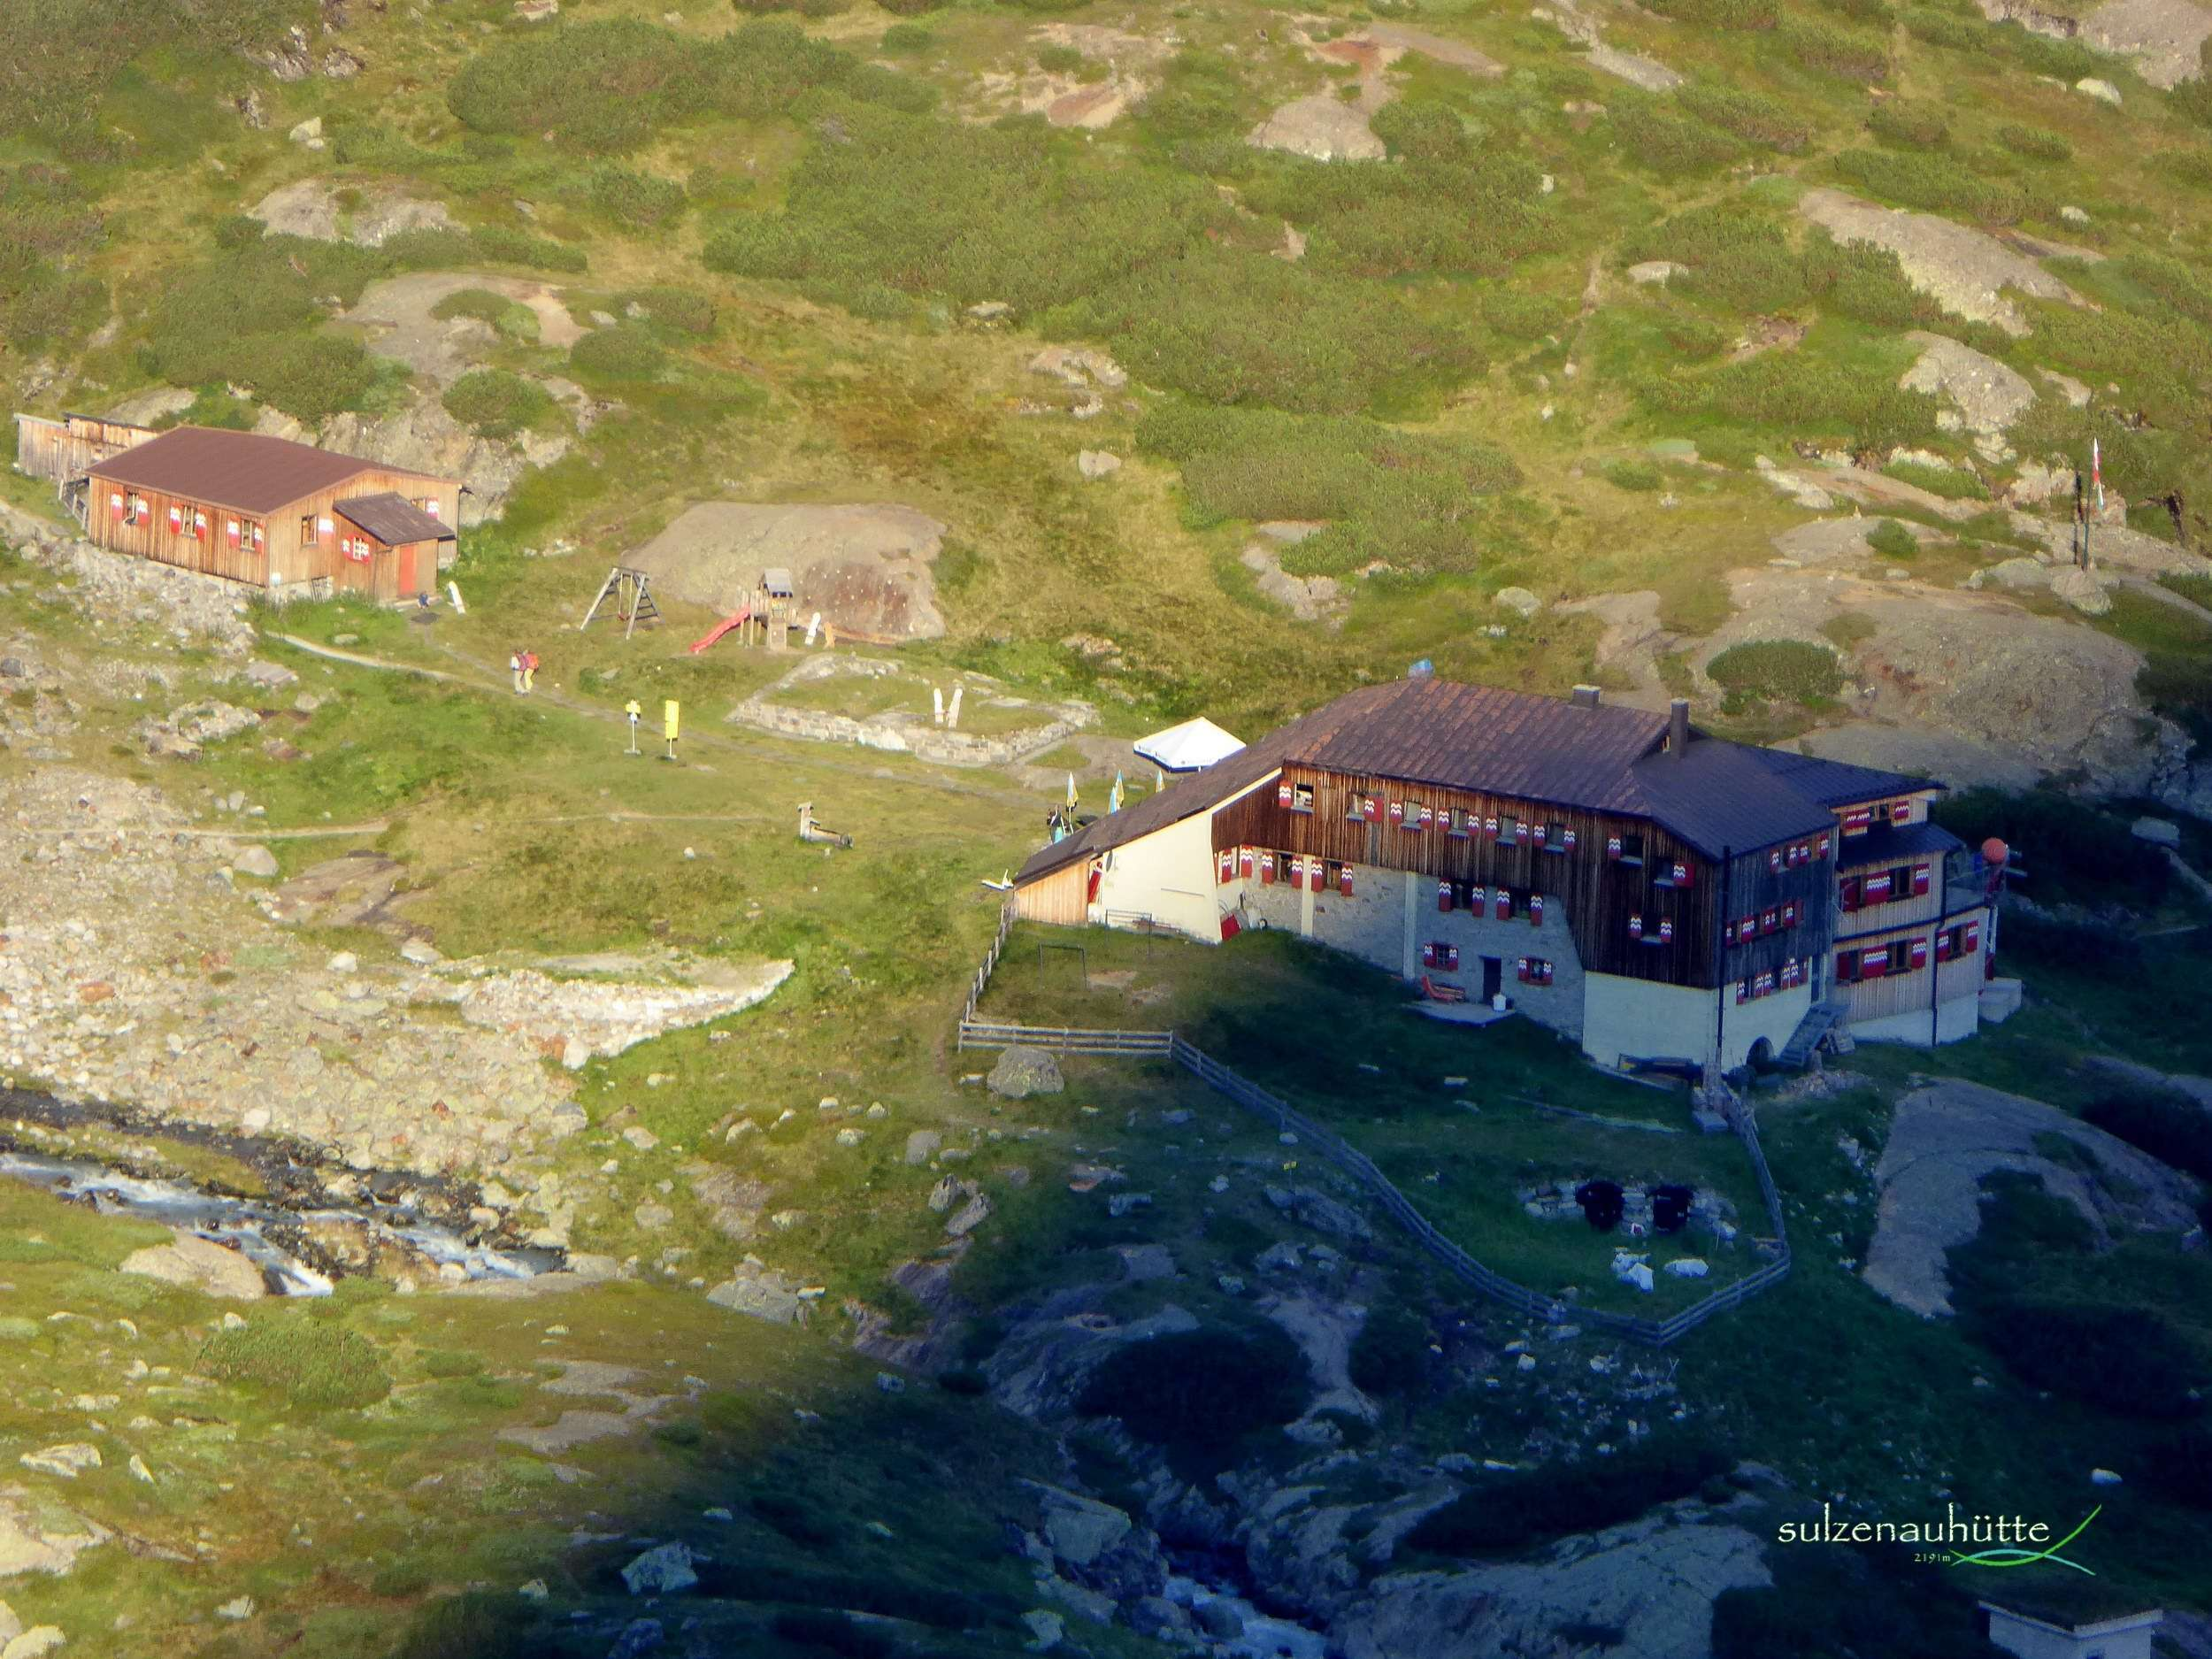 Sulzenau hut - Stubai High Trail